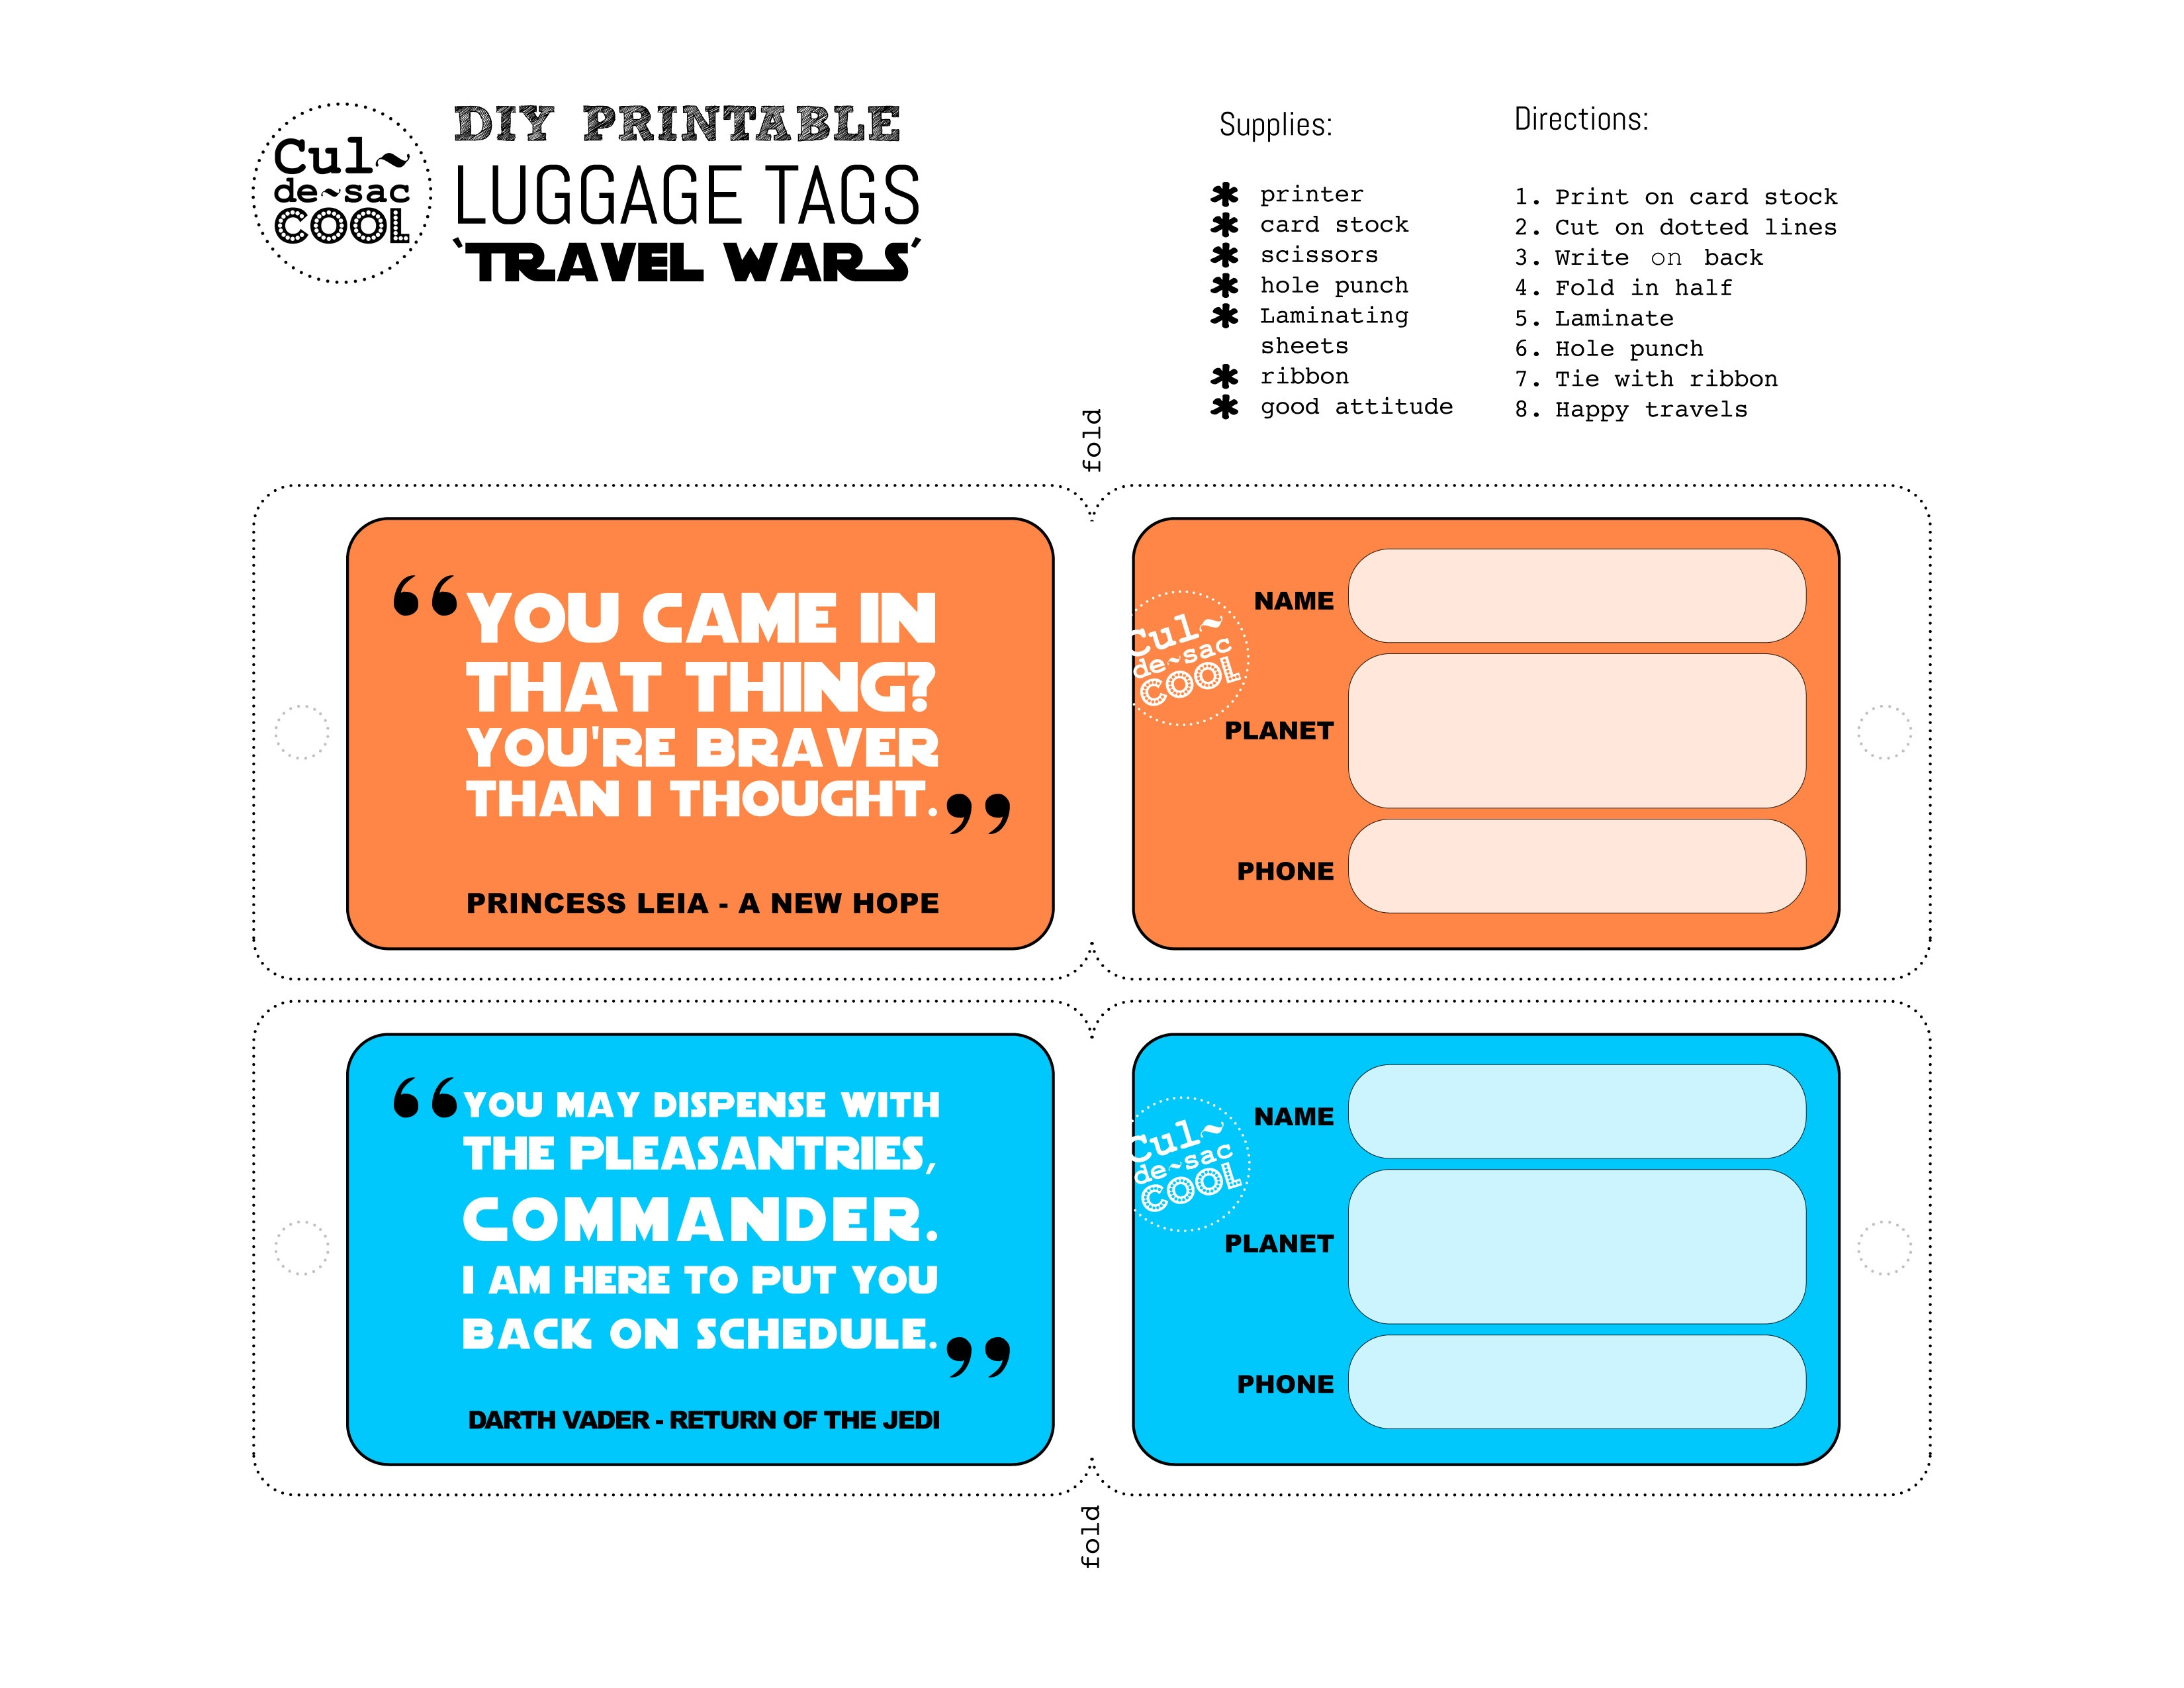 Diy Printable Luggage Tags 'travel Wars' - Free Printable Luggage Tags